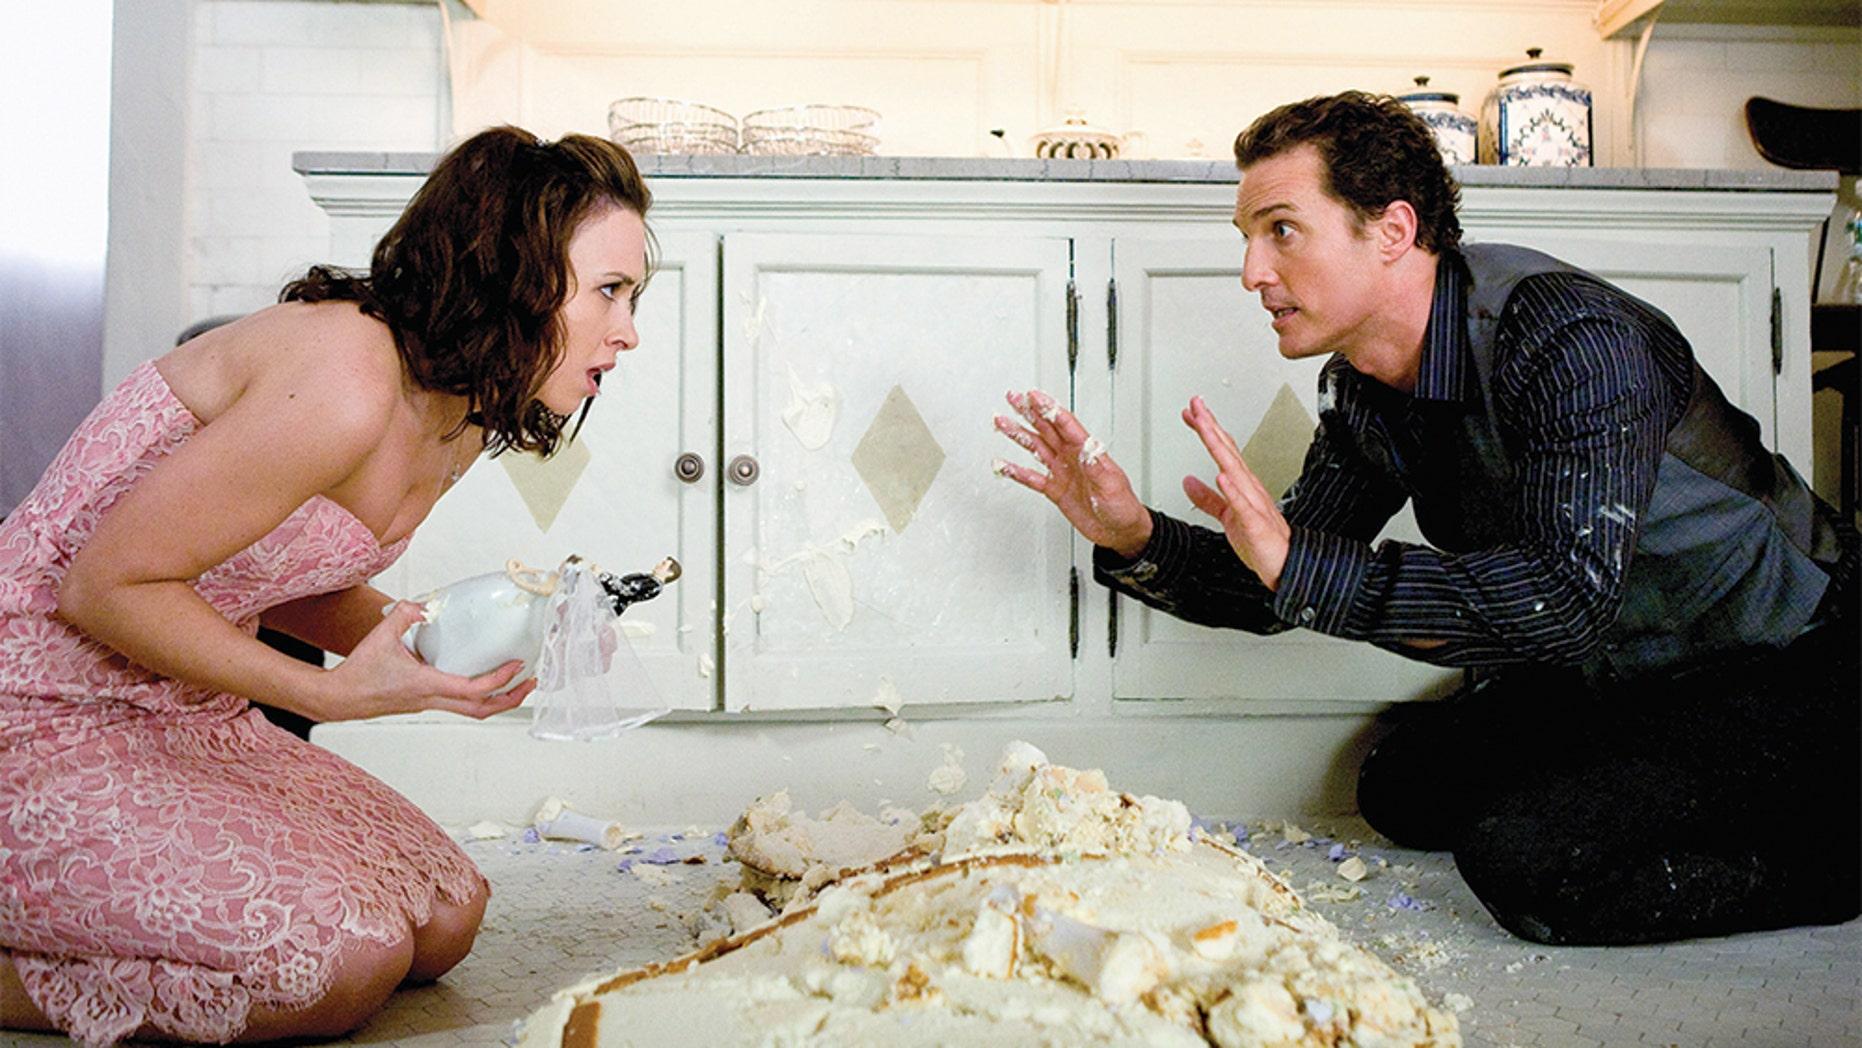 Matthew McConaughey Defends Romantic Comedy